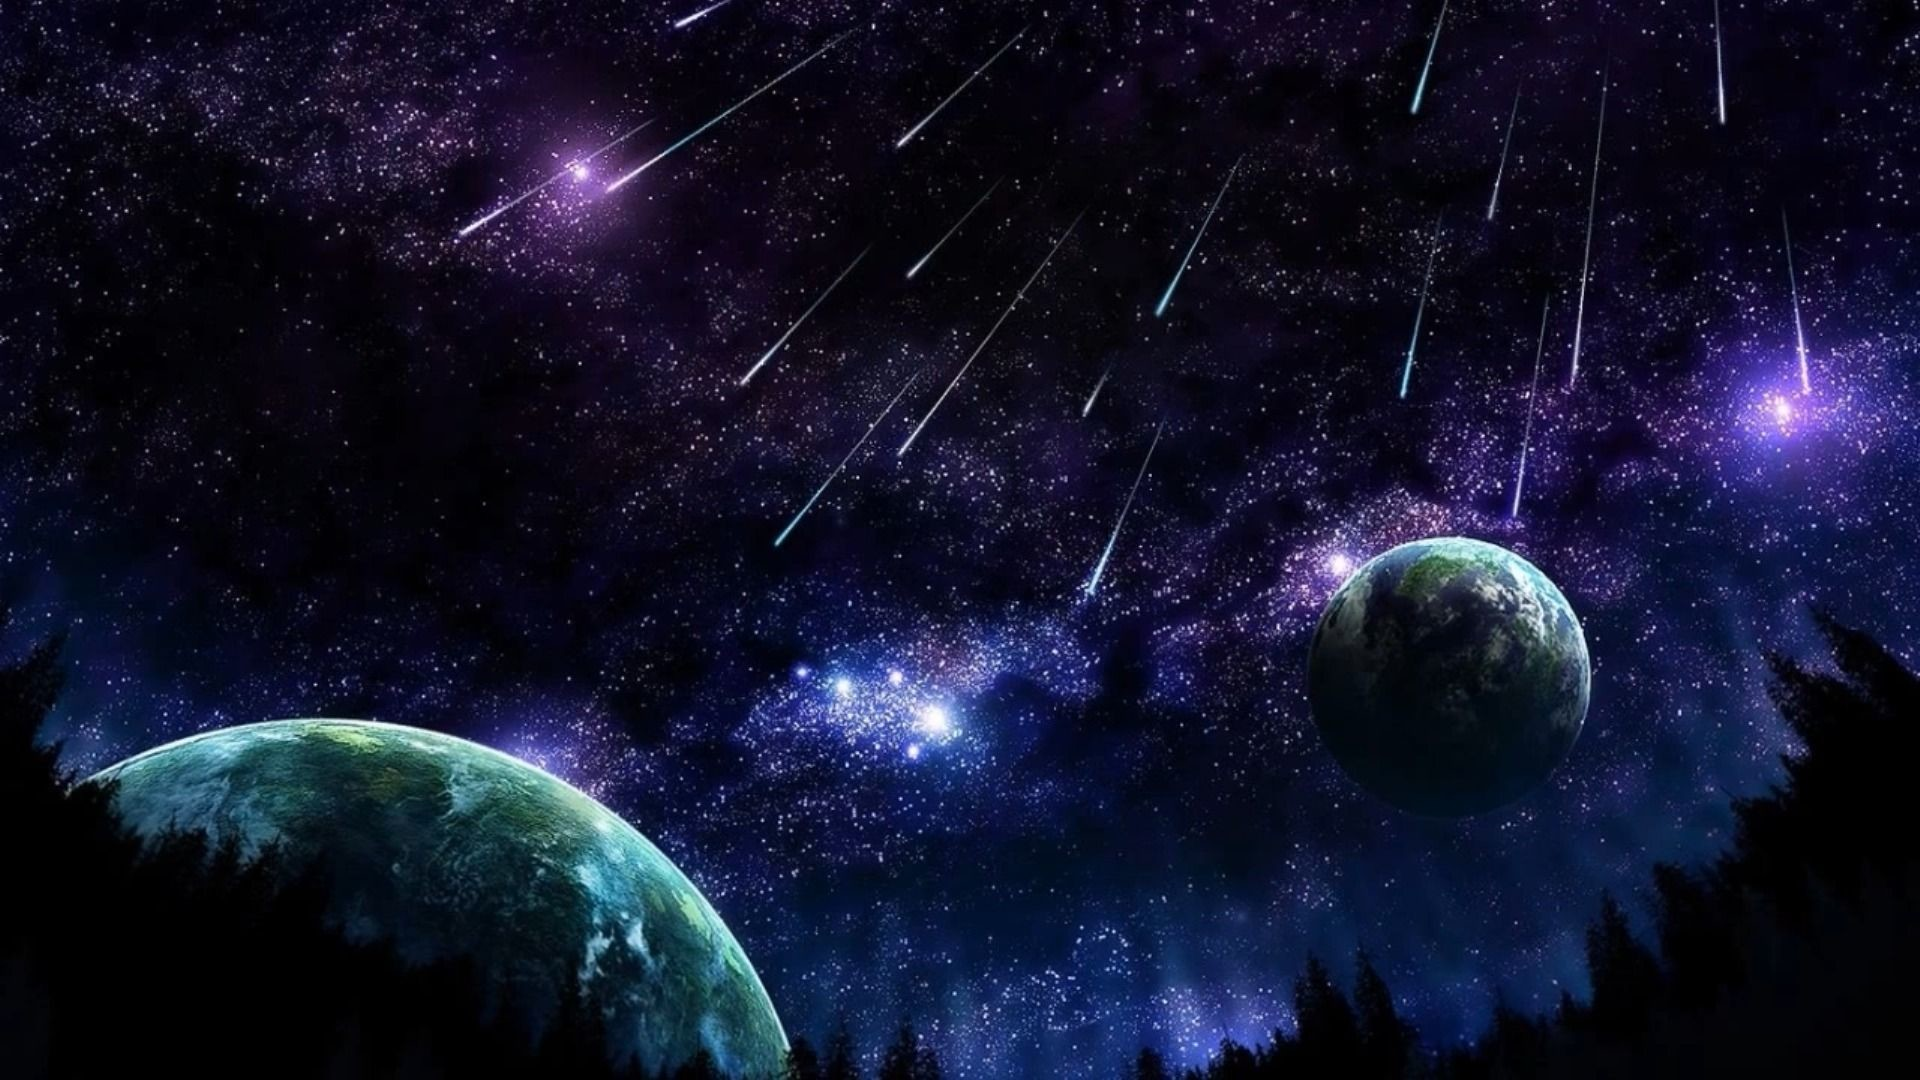 Res: 1920x1080, Shooting Stars Planets wallpaper free